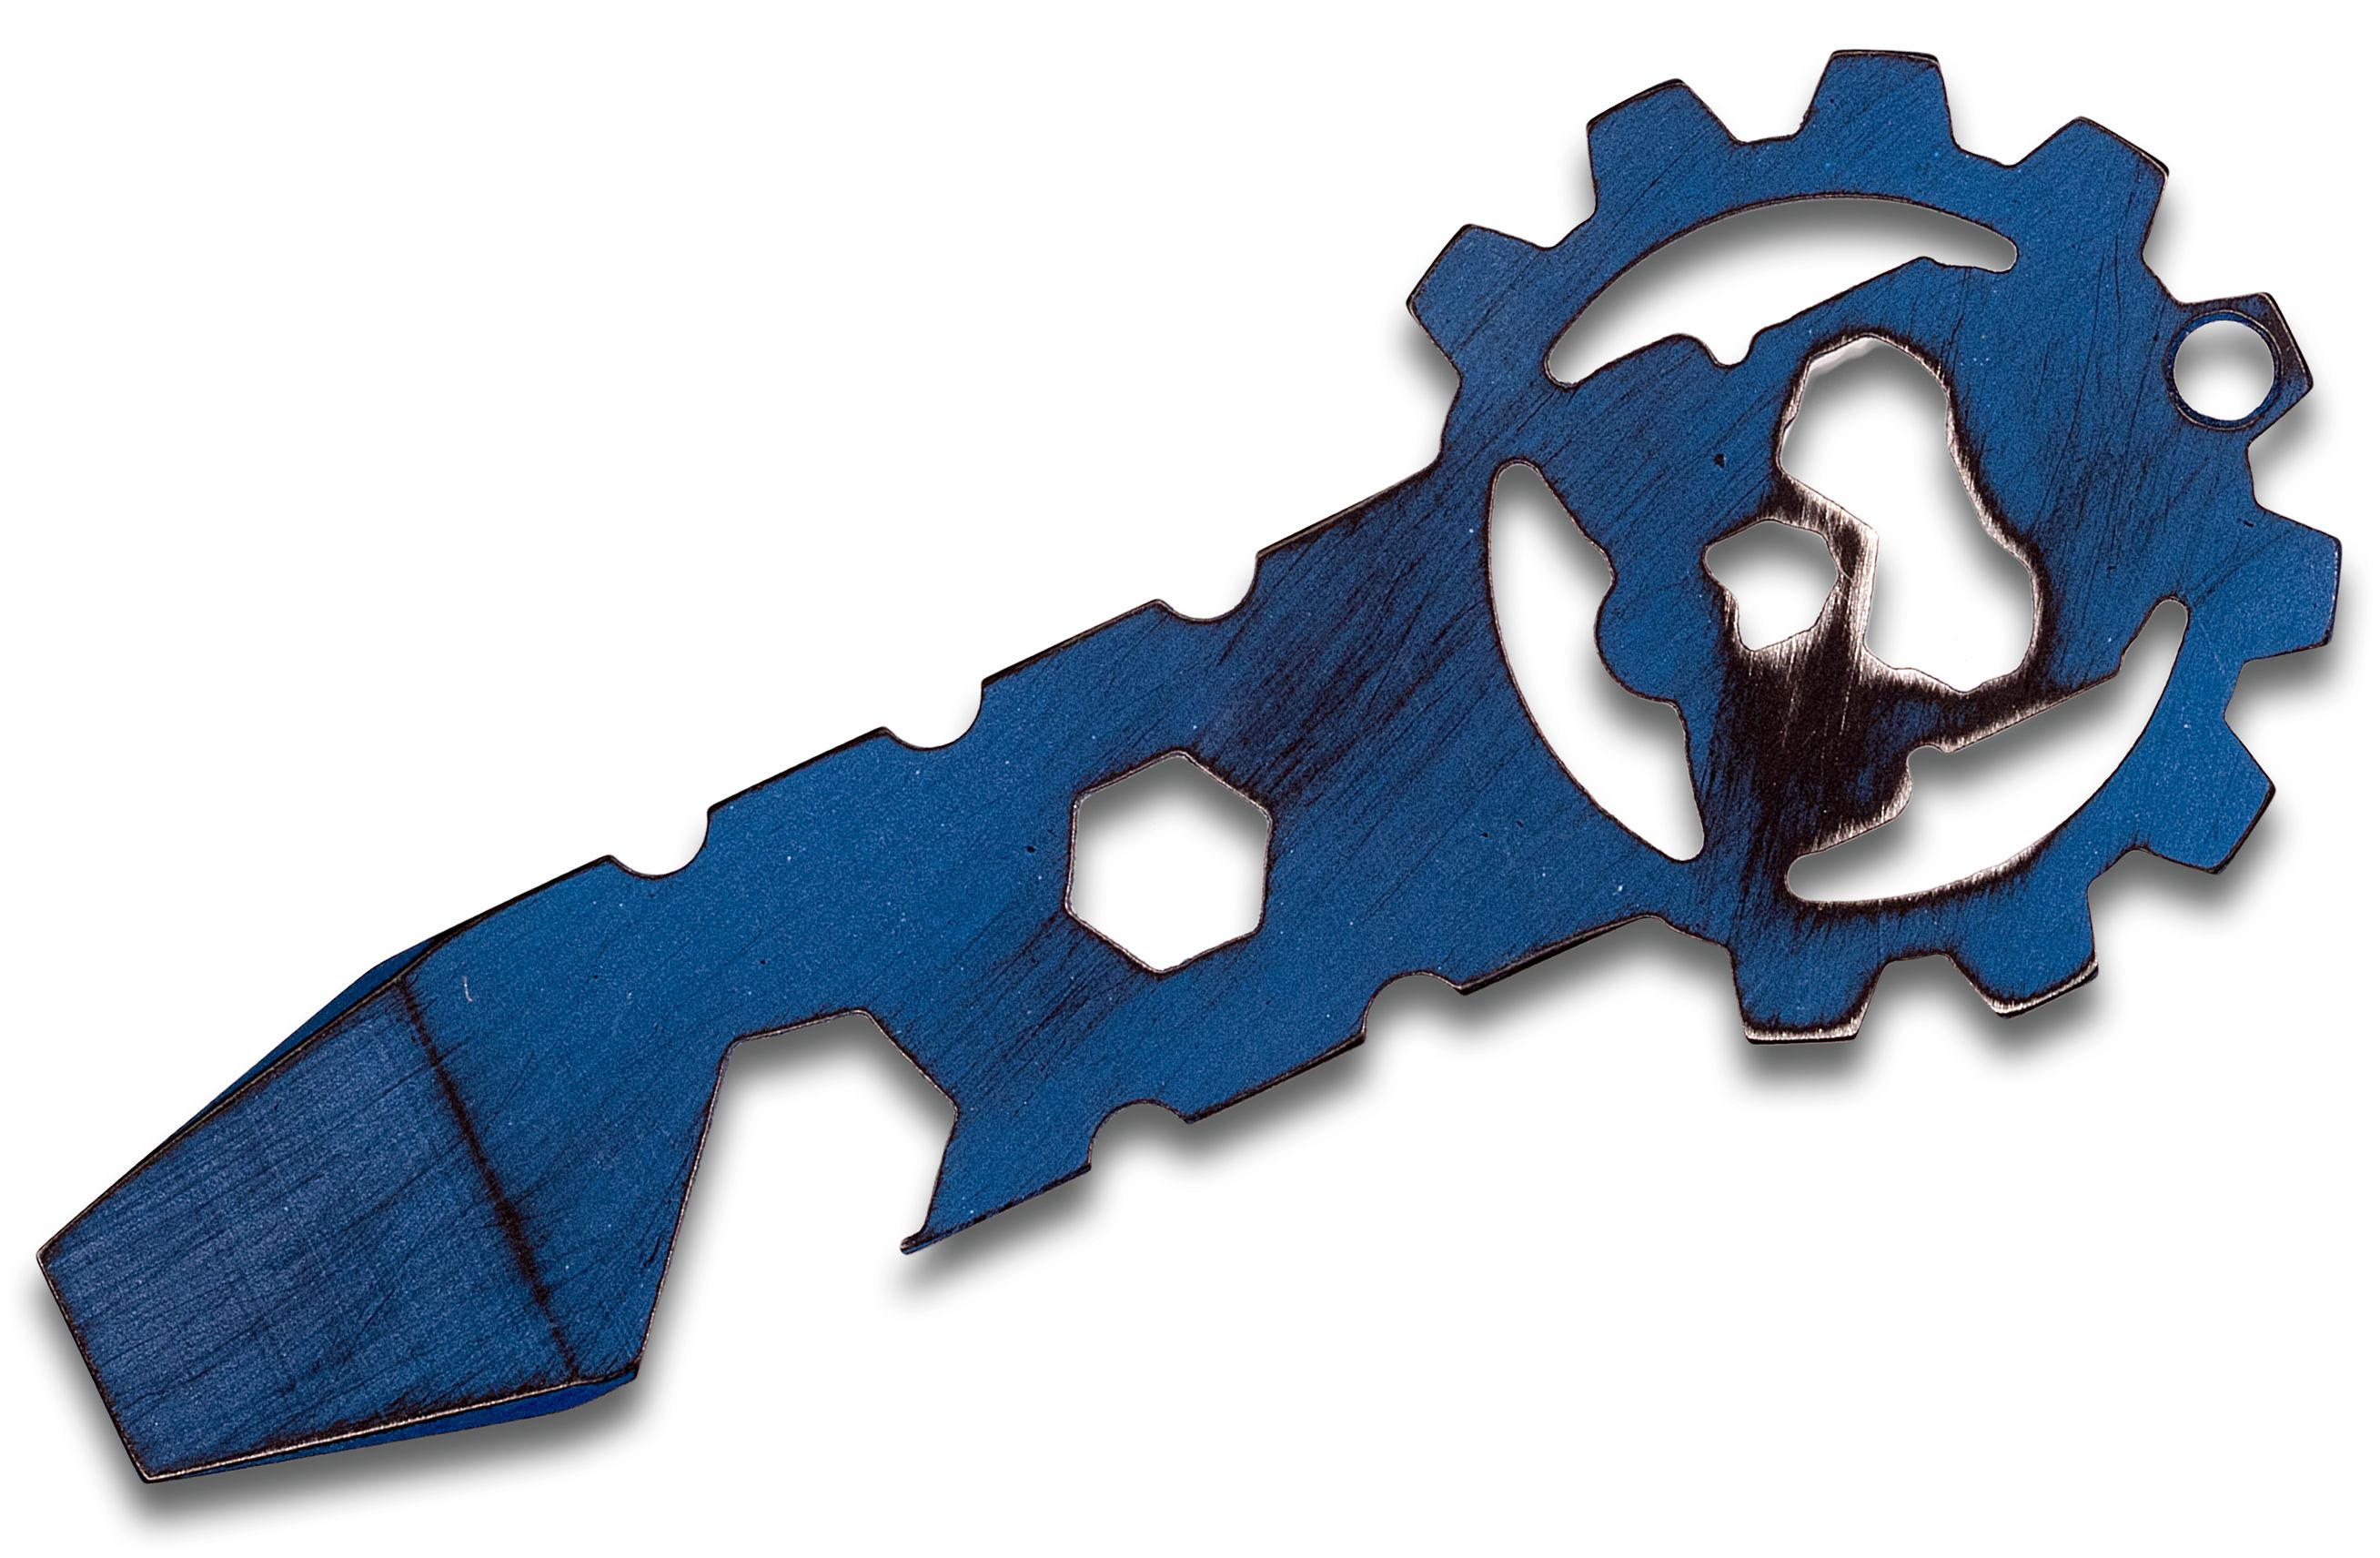 Smock Knives SmocKey Titanium Keychain Pocket Tool, Blue Battleworn Cerakote, 3.25 inch Overall